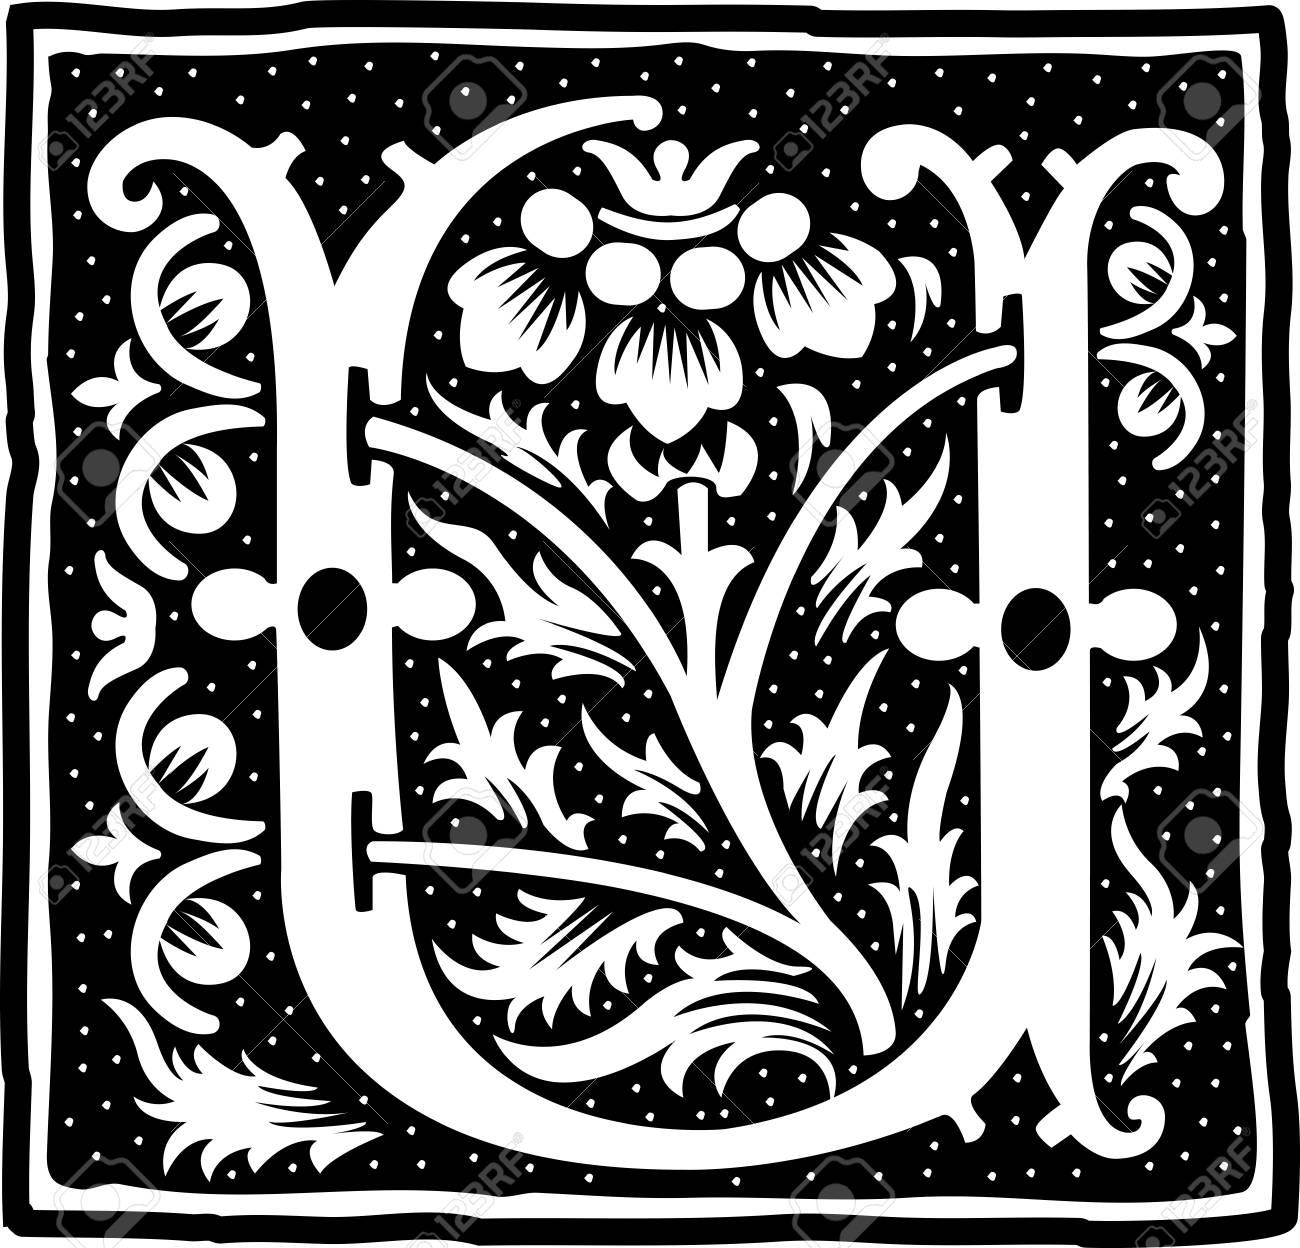 English Alphabet With Flowers Decoration Monochrome Letter U